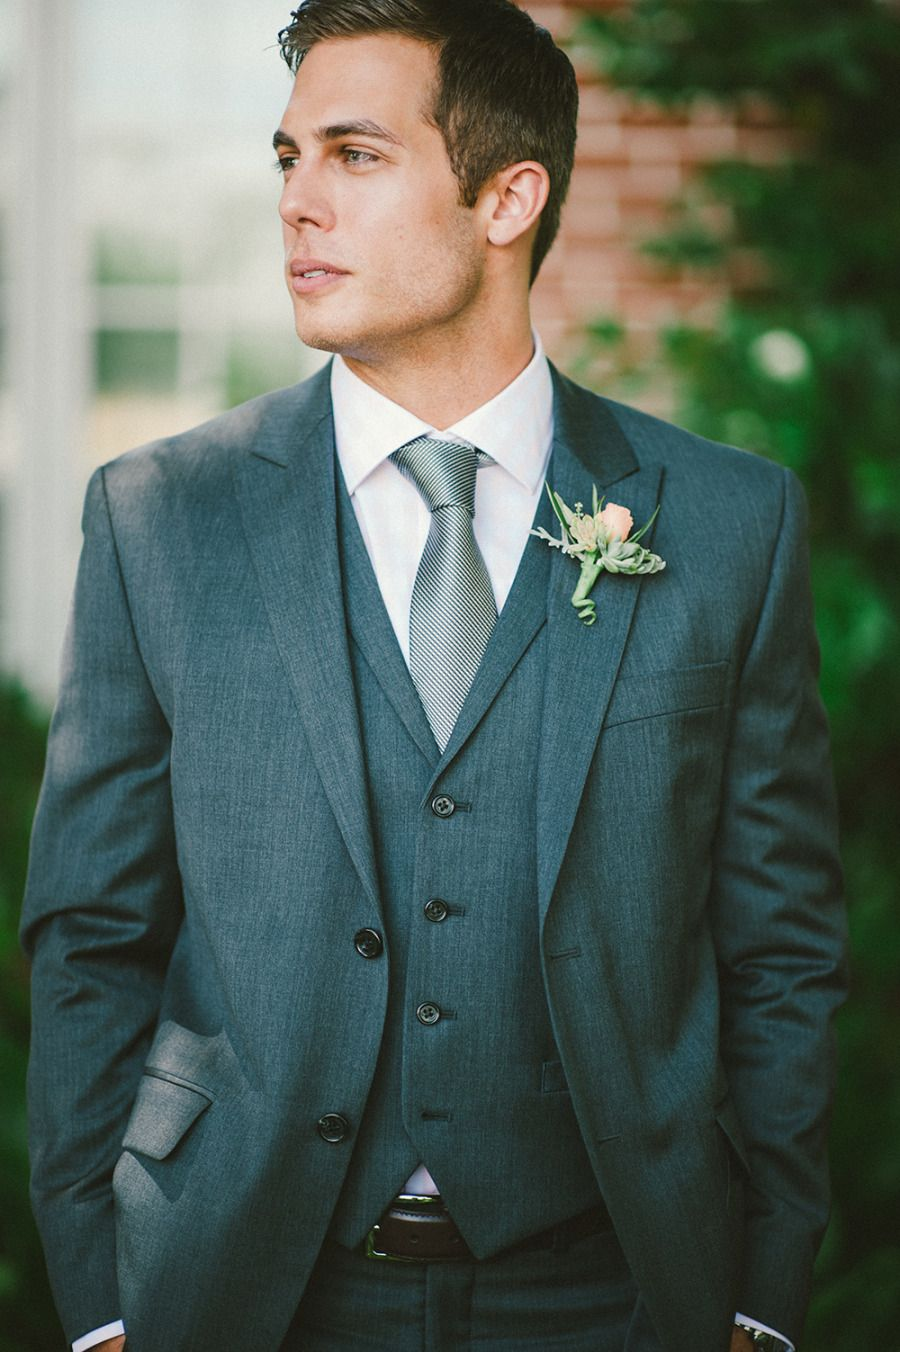 Colorful Vineyard Wedding in Lodi, California | Wedding, Wedding ...